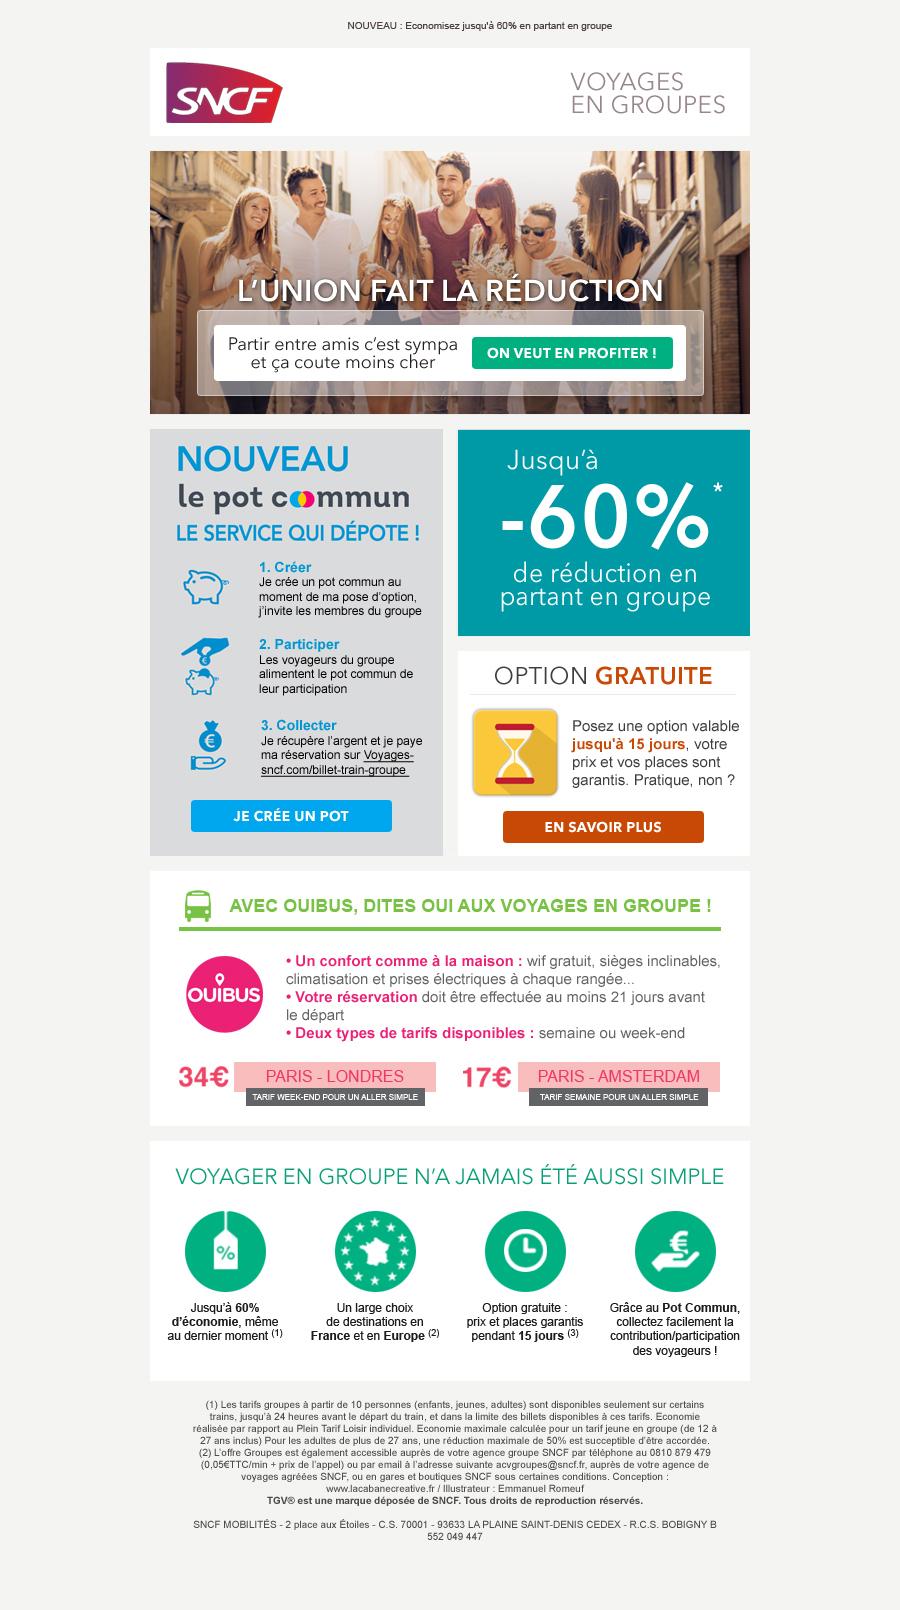 SNCF News